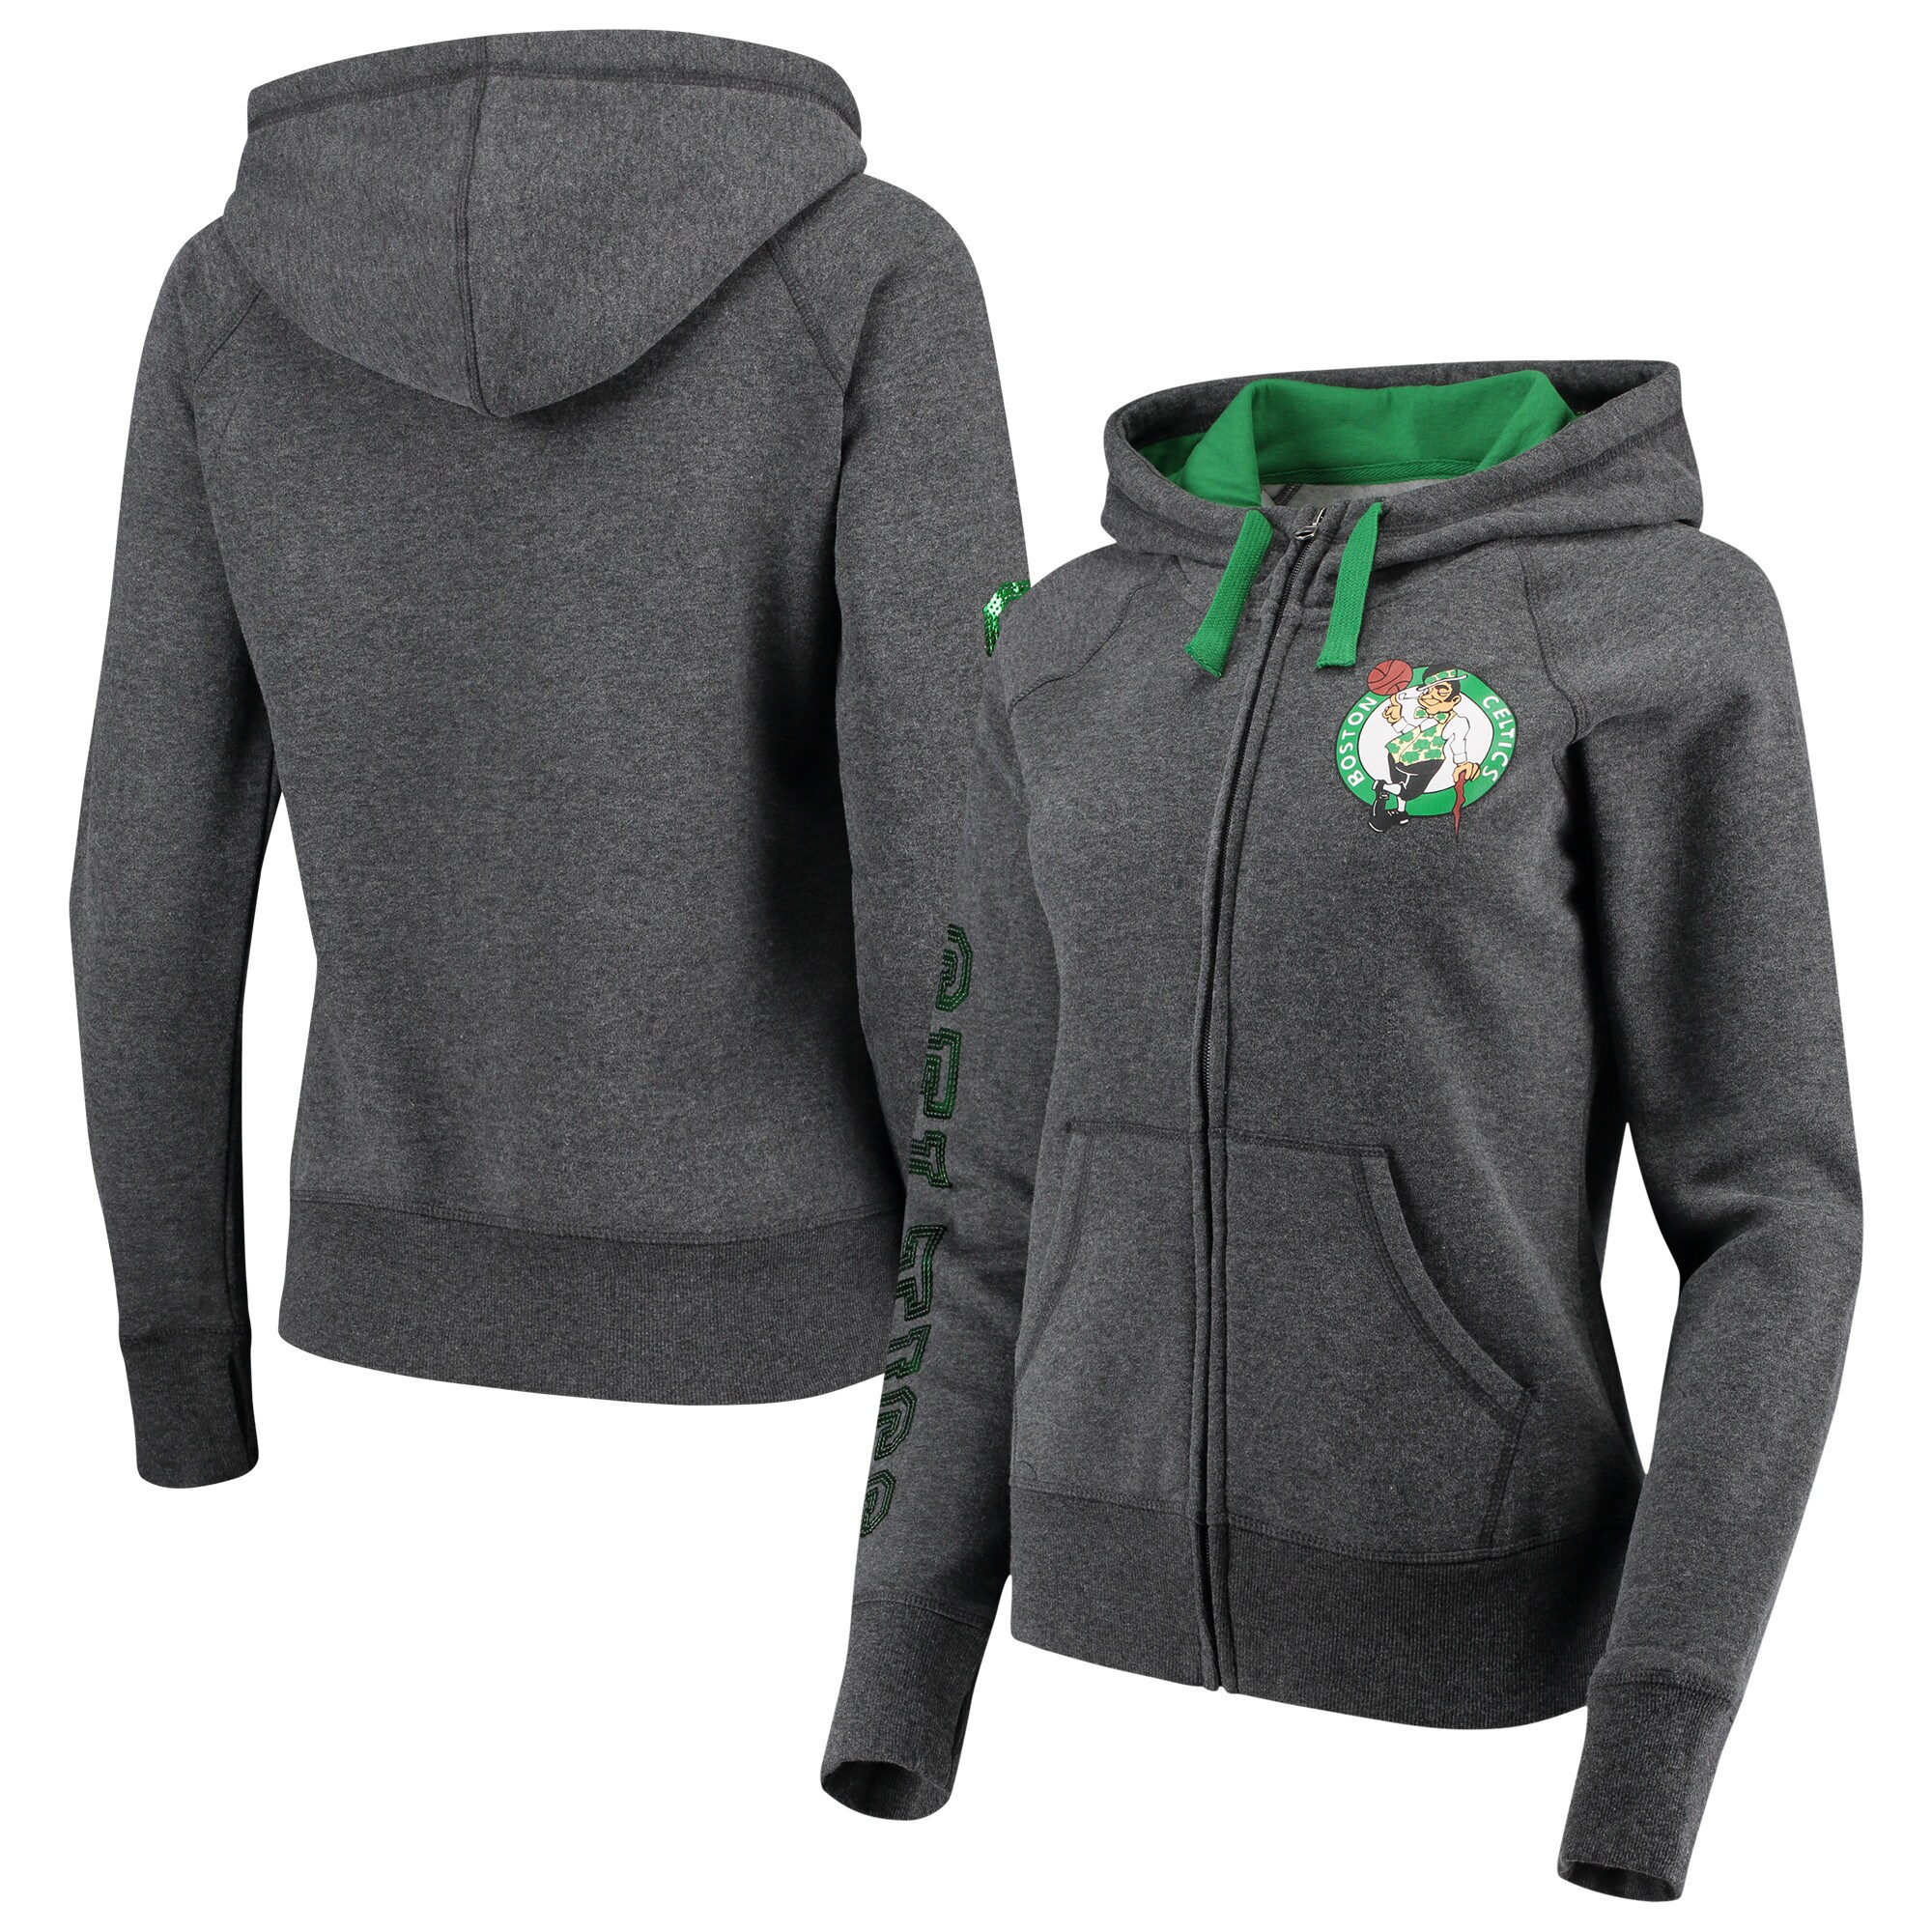 Boston Celtics G-III 4Her by Carl Banks Women's Playoff Suede Fleece Full-Zip Jacket - Charcoal/Green